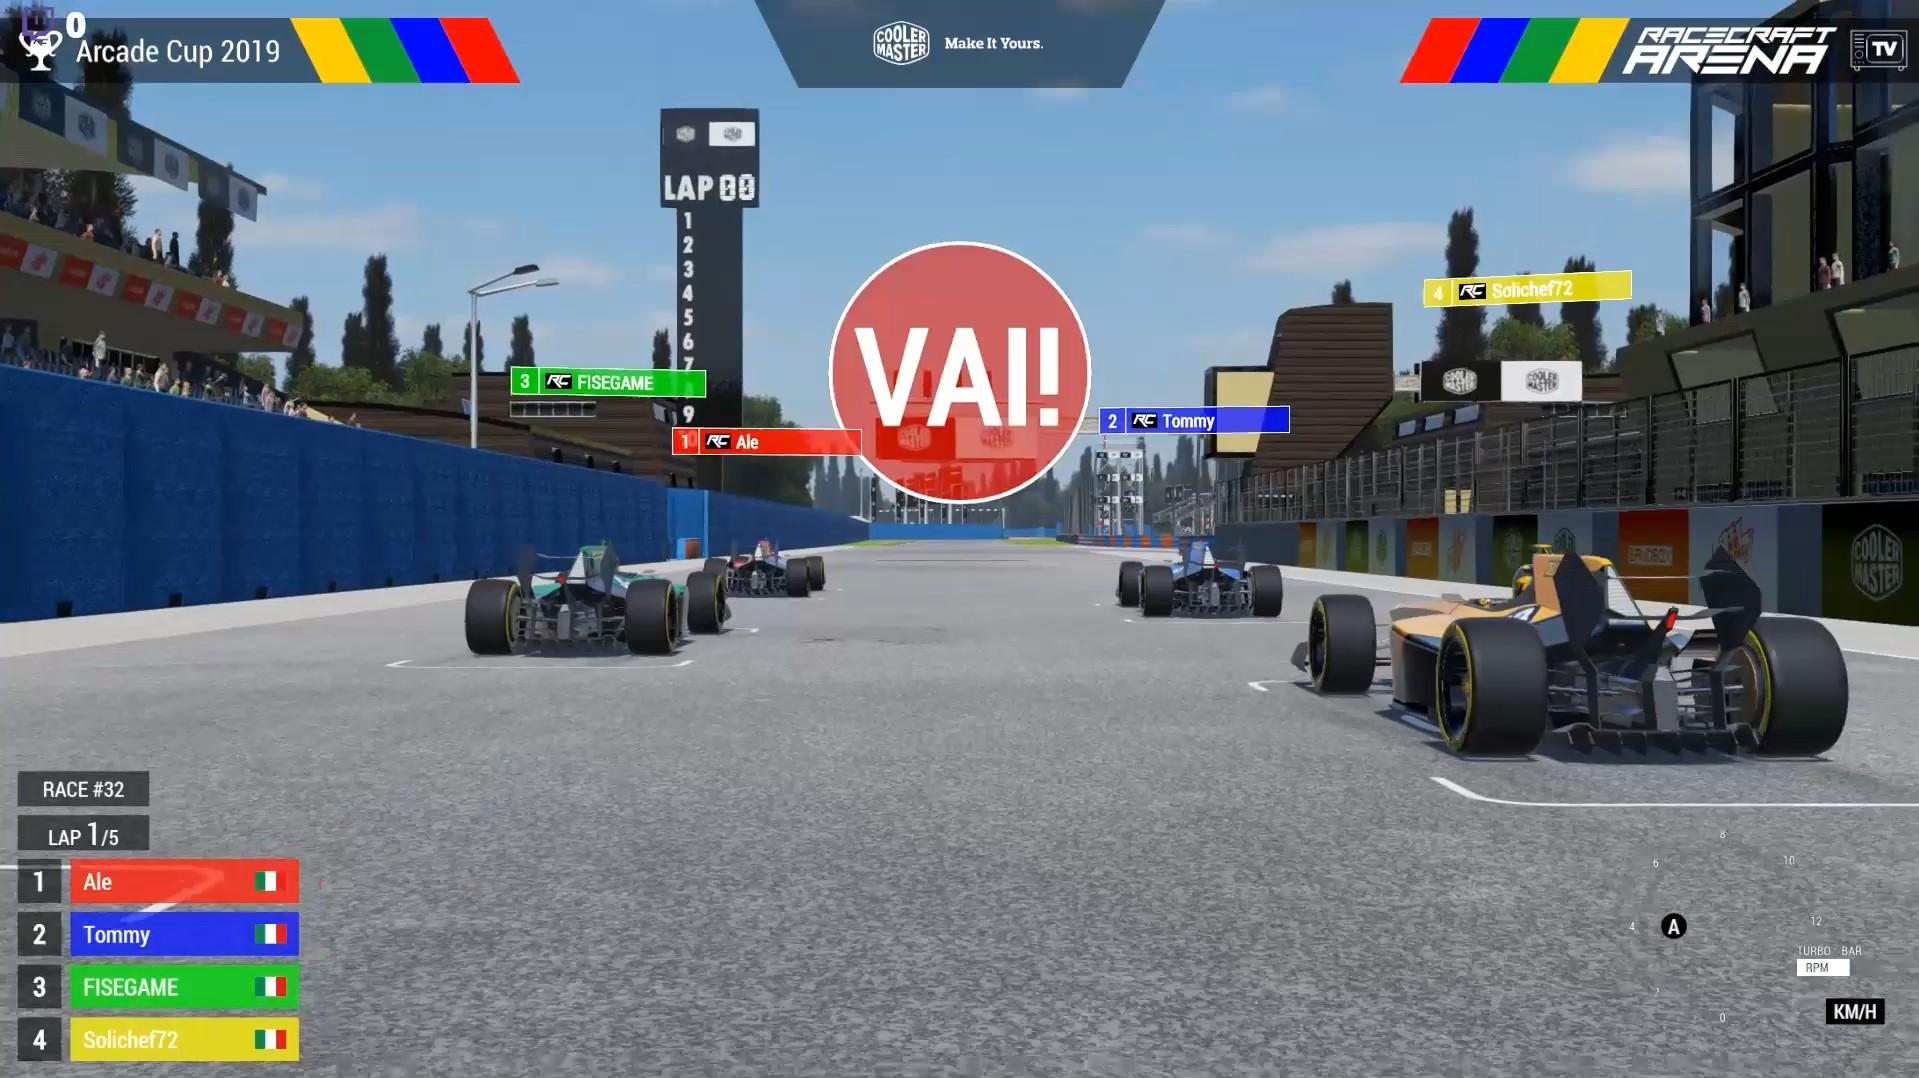 RC_Arena_Screenshot_04